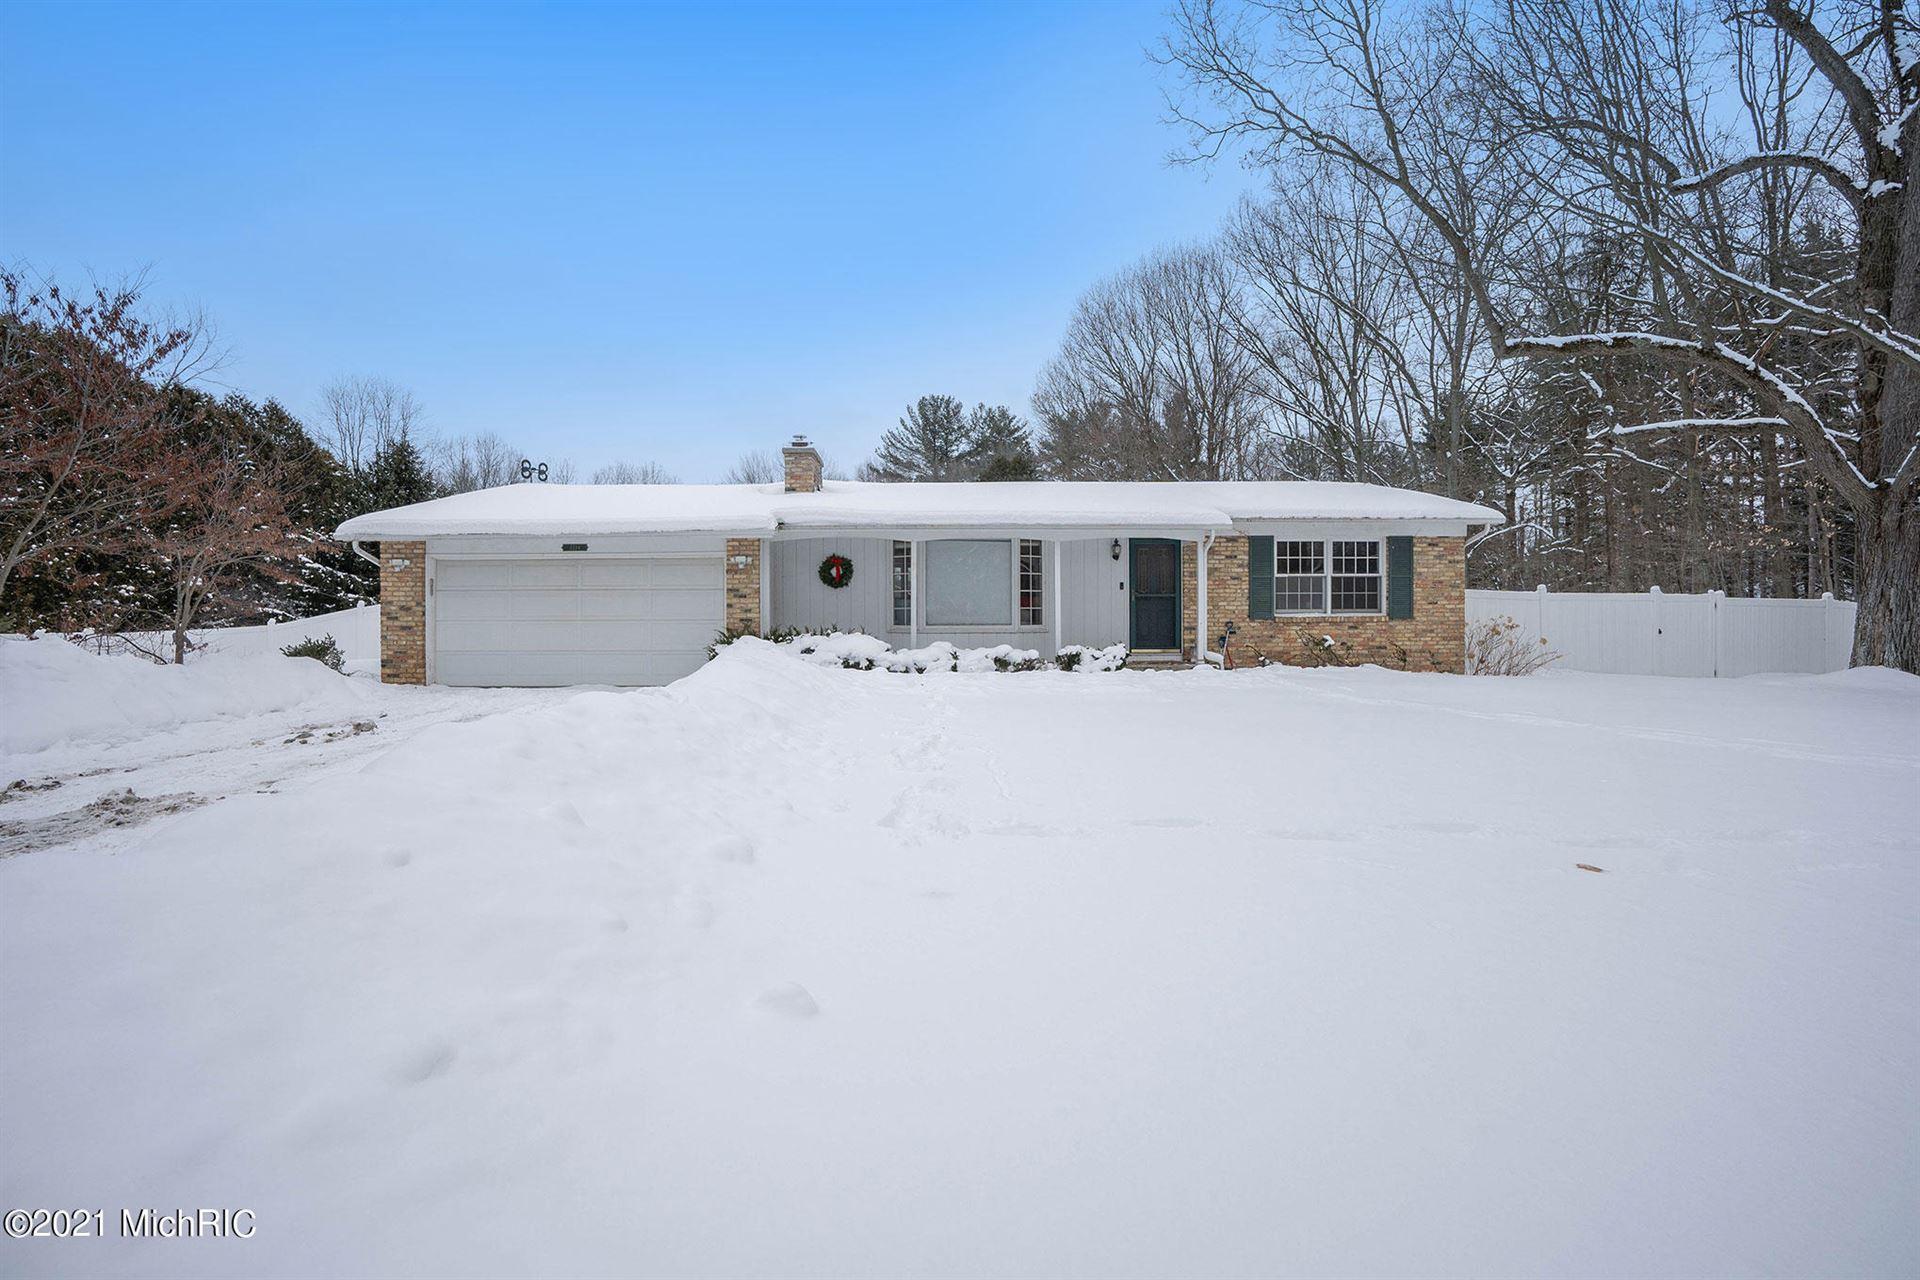 Photo of 7214 Ramsdell Drive NE, Rockford, MI 49341 (MLS # 21004299)